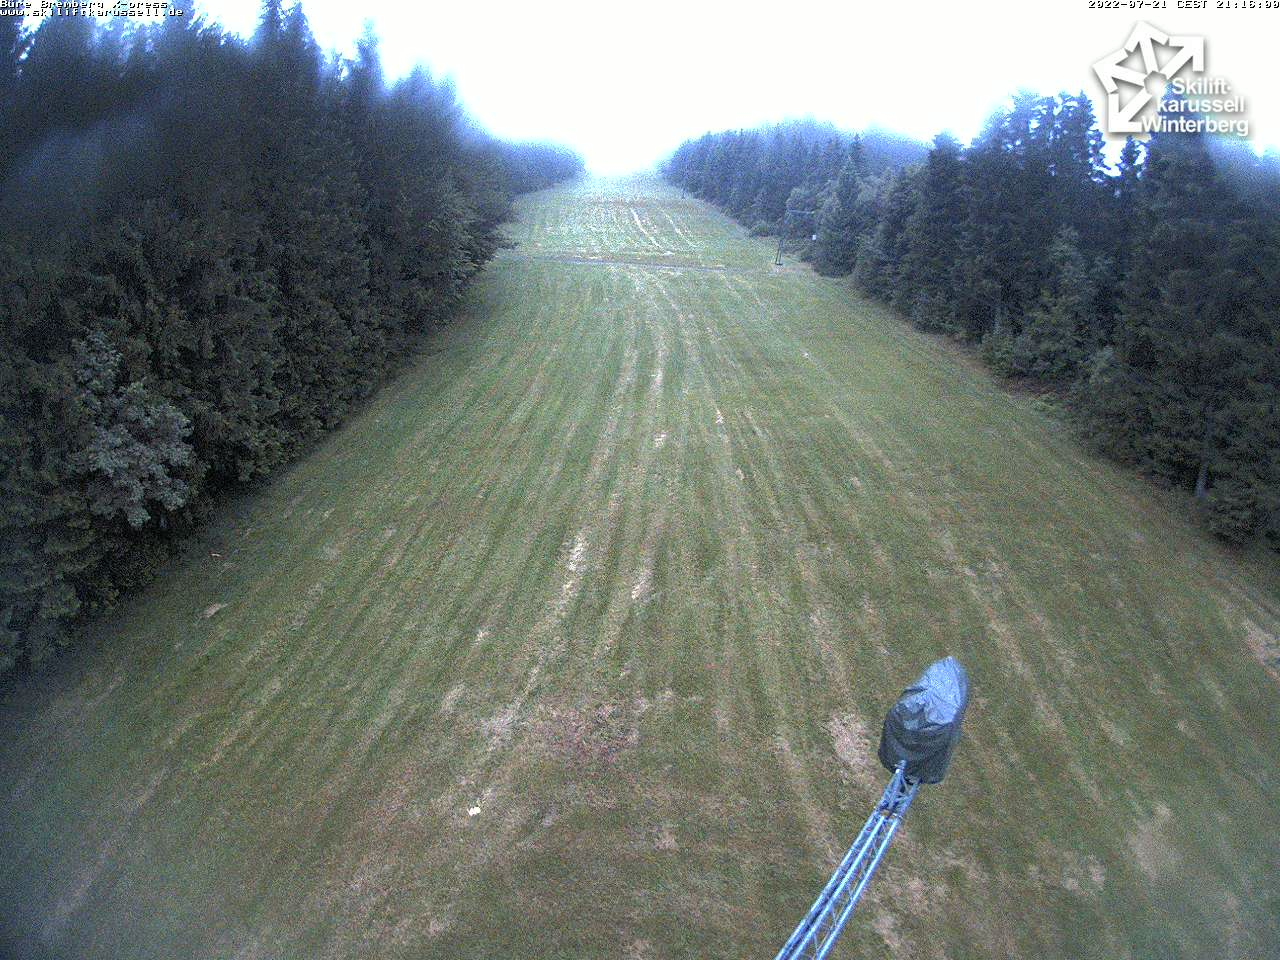 Webcam Winterberg - Bremberglift